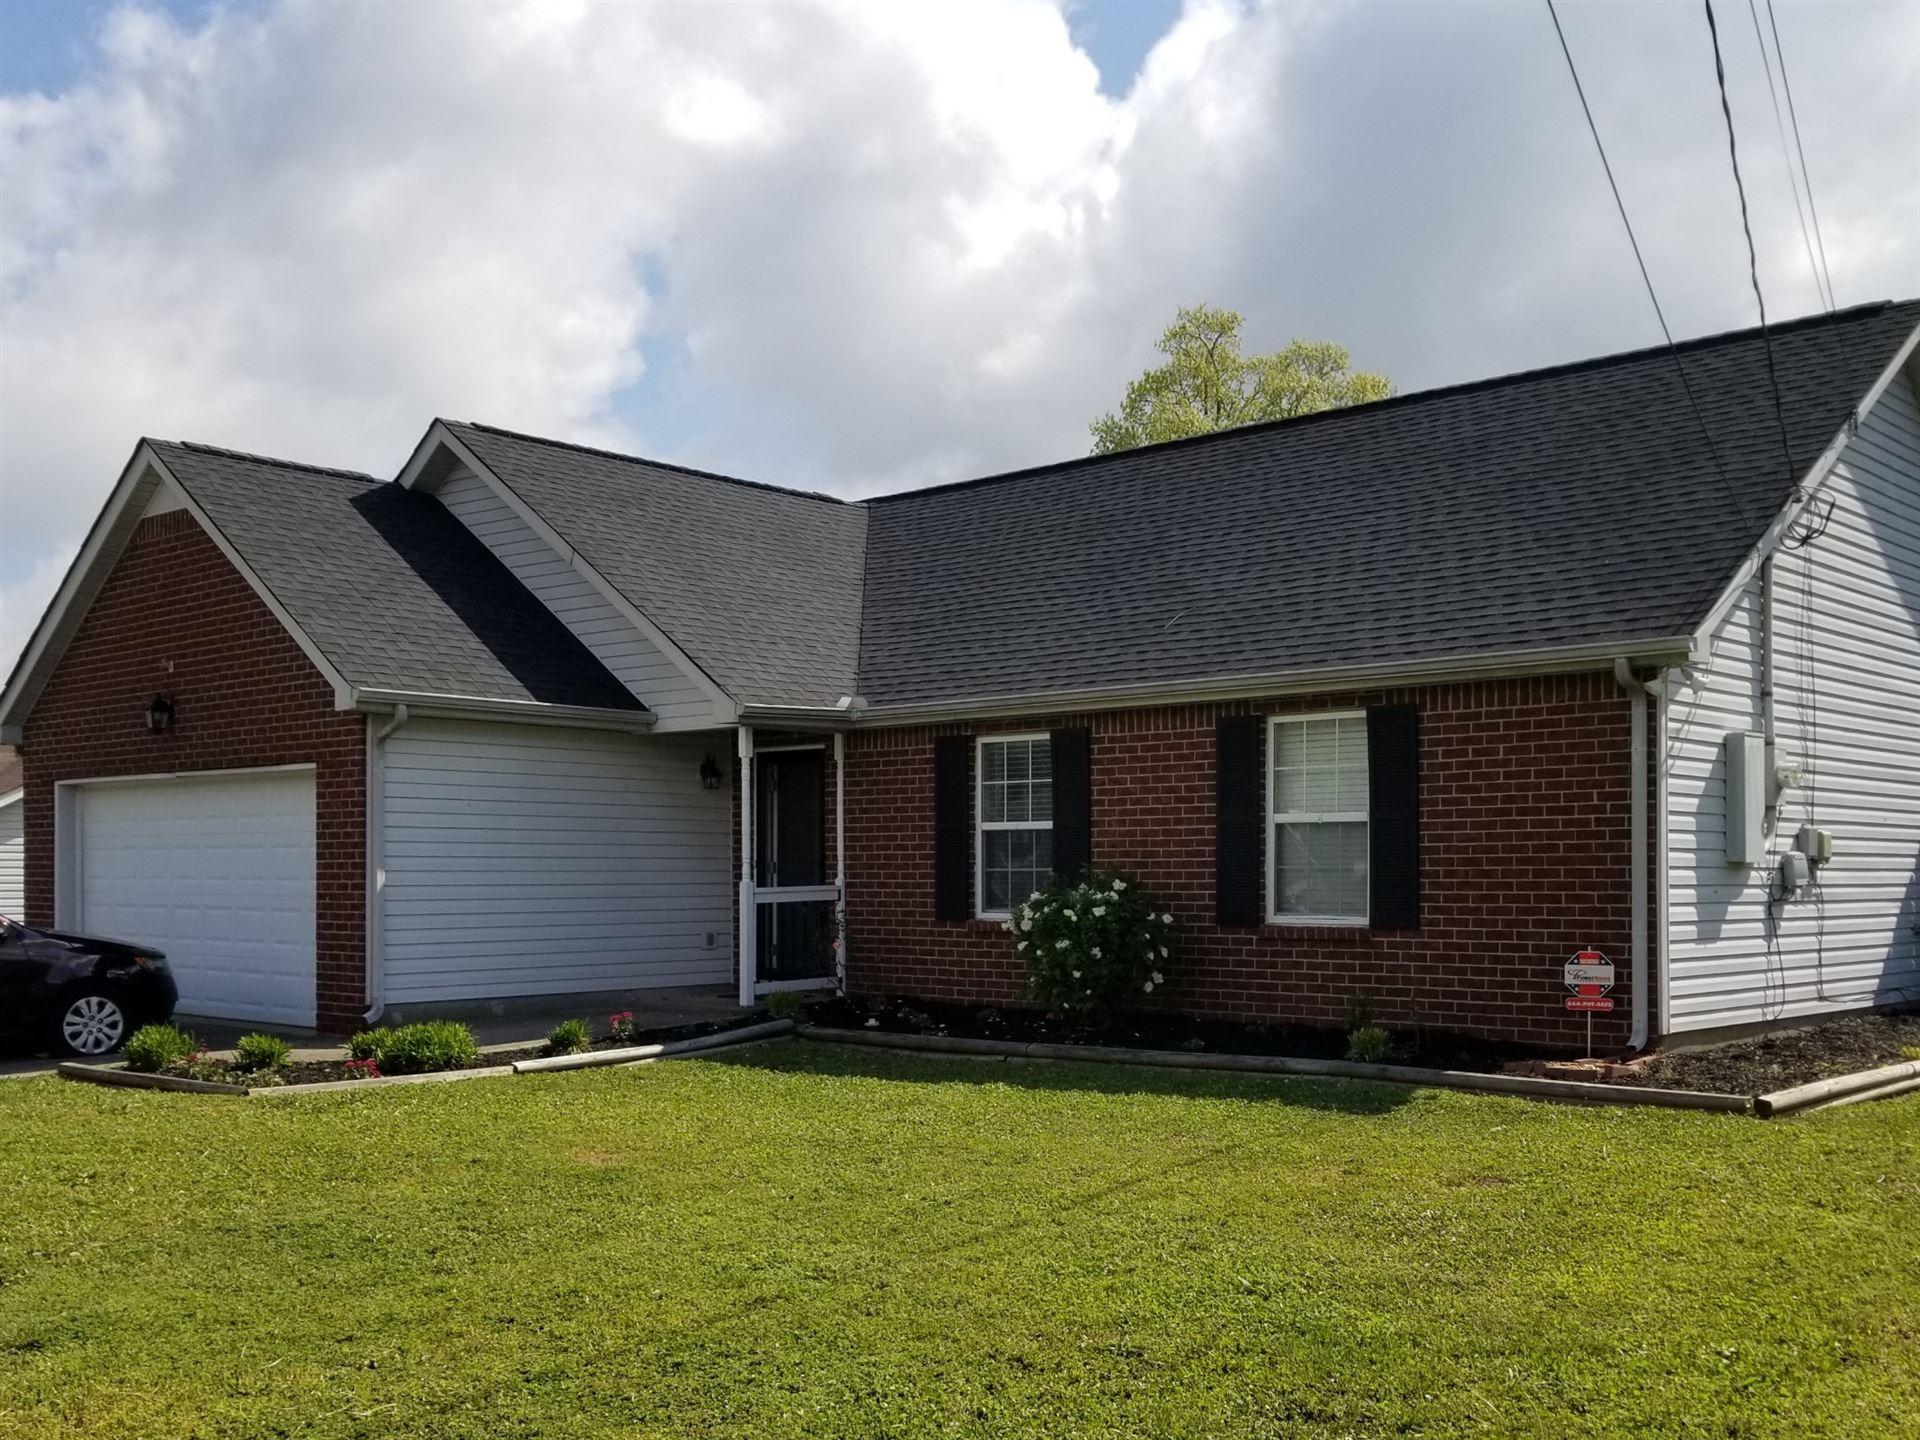 Photo of 418 Barking Dr, Smyrna, TN 37167 (MLS # 2243504)